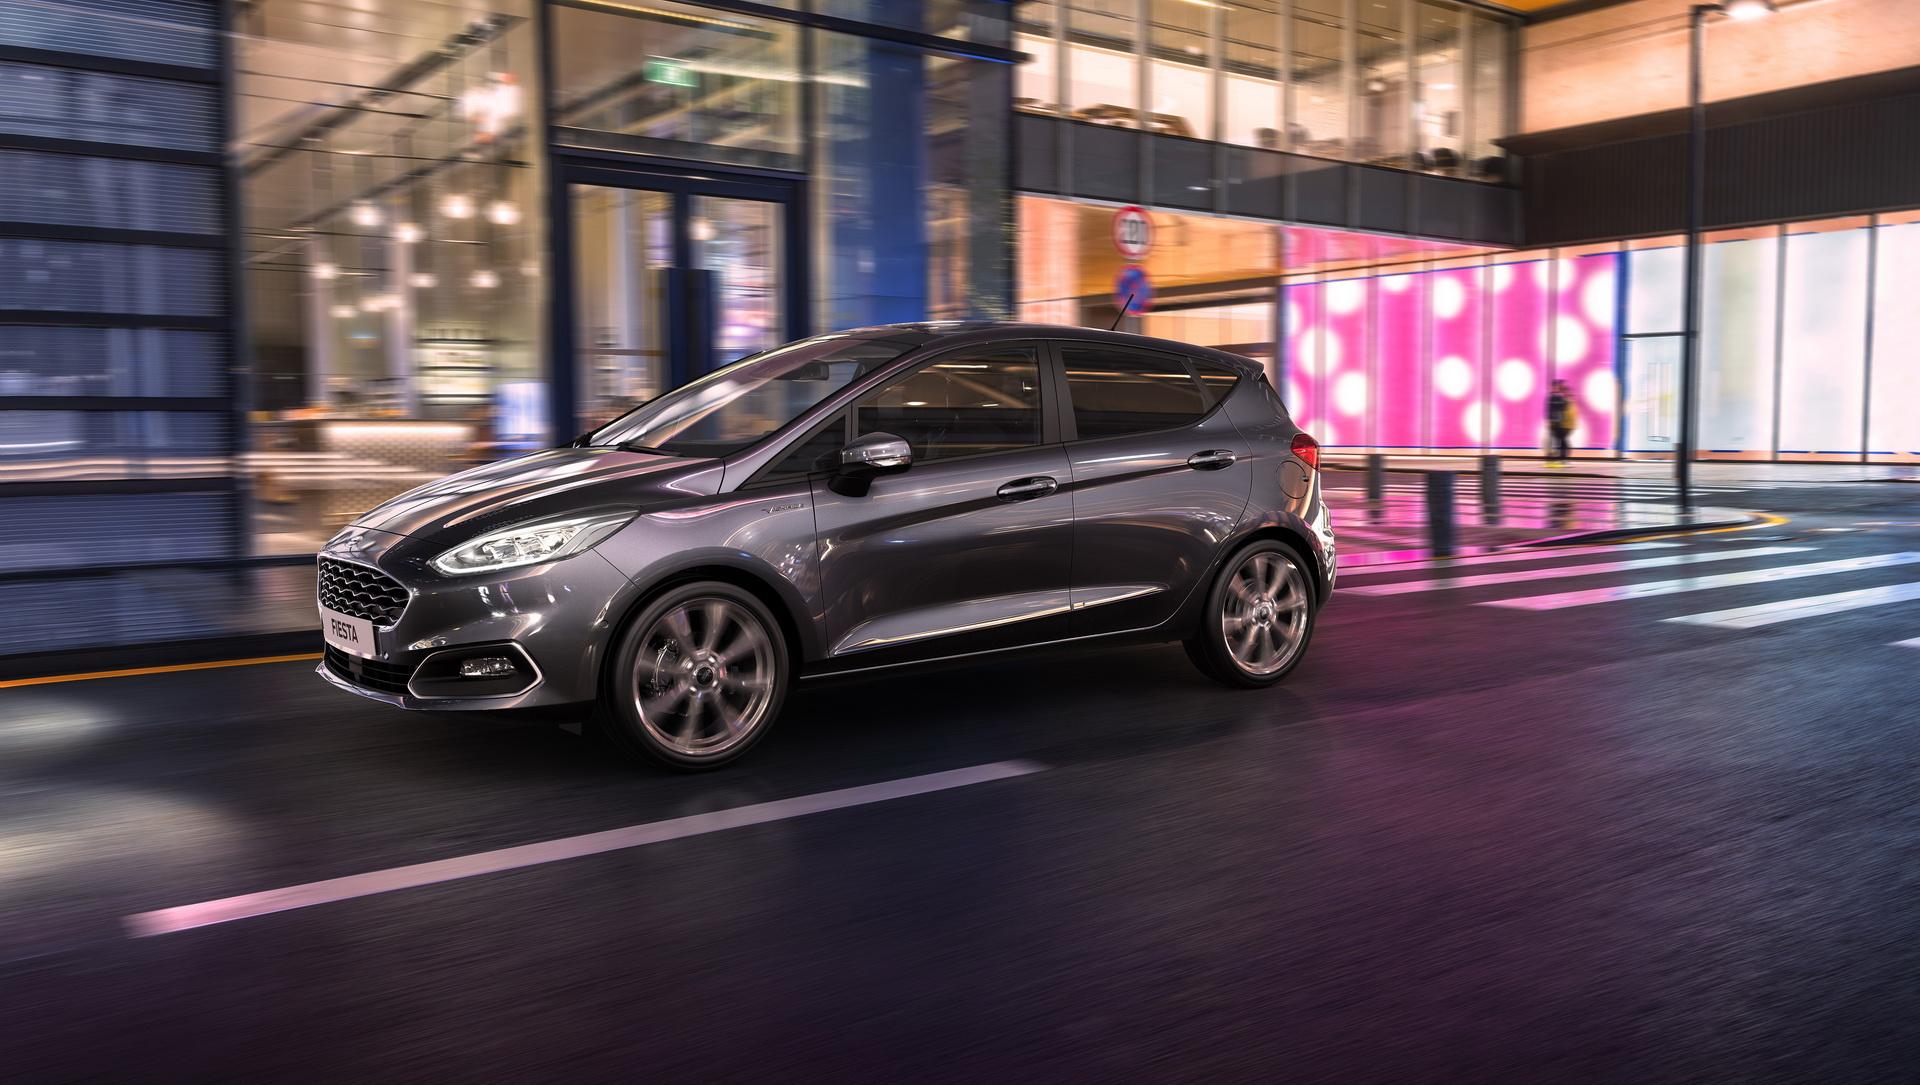 Ford Fiesta (2020) mild hybrid